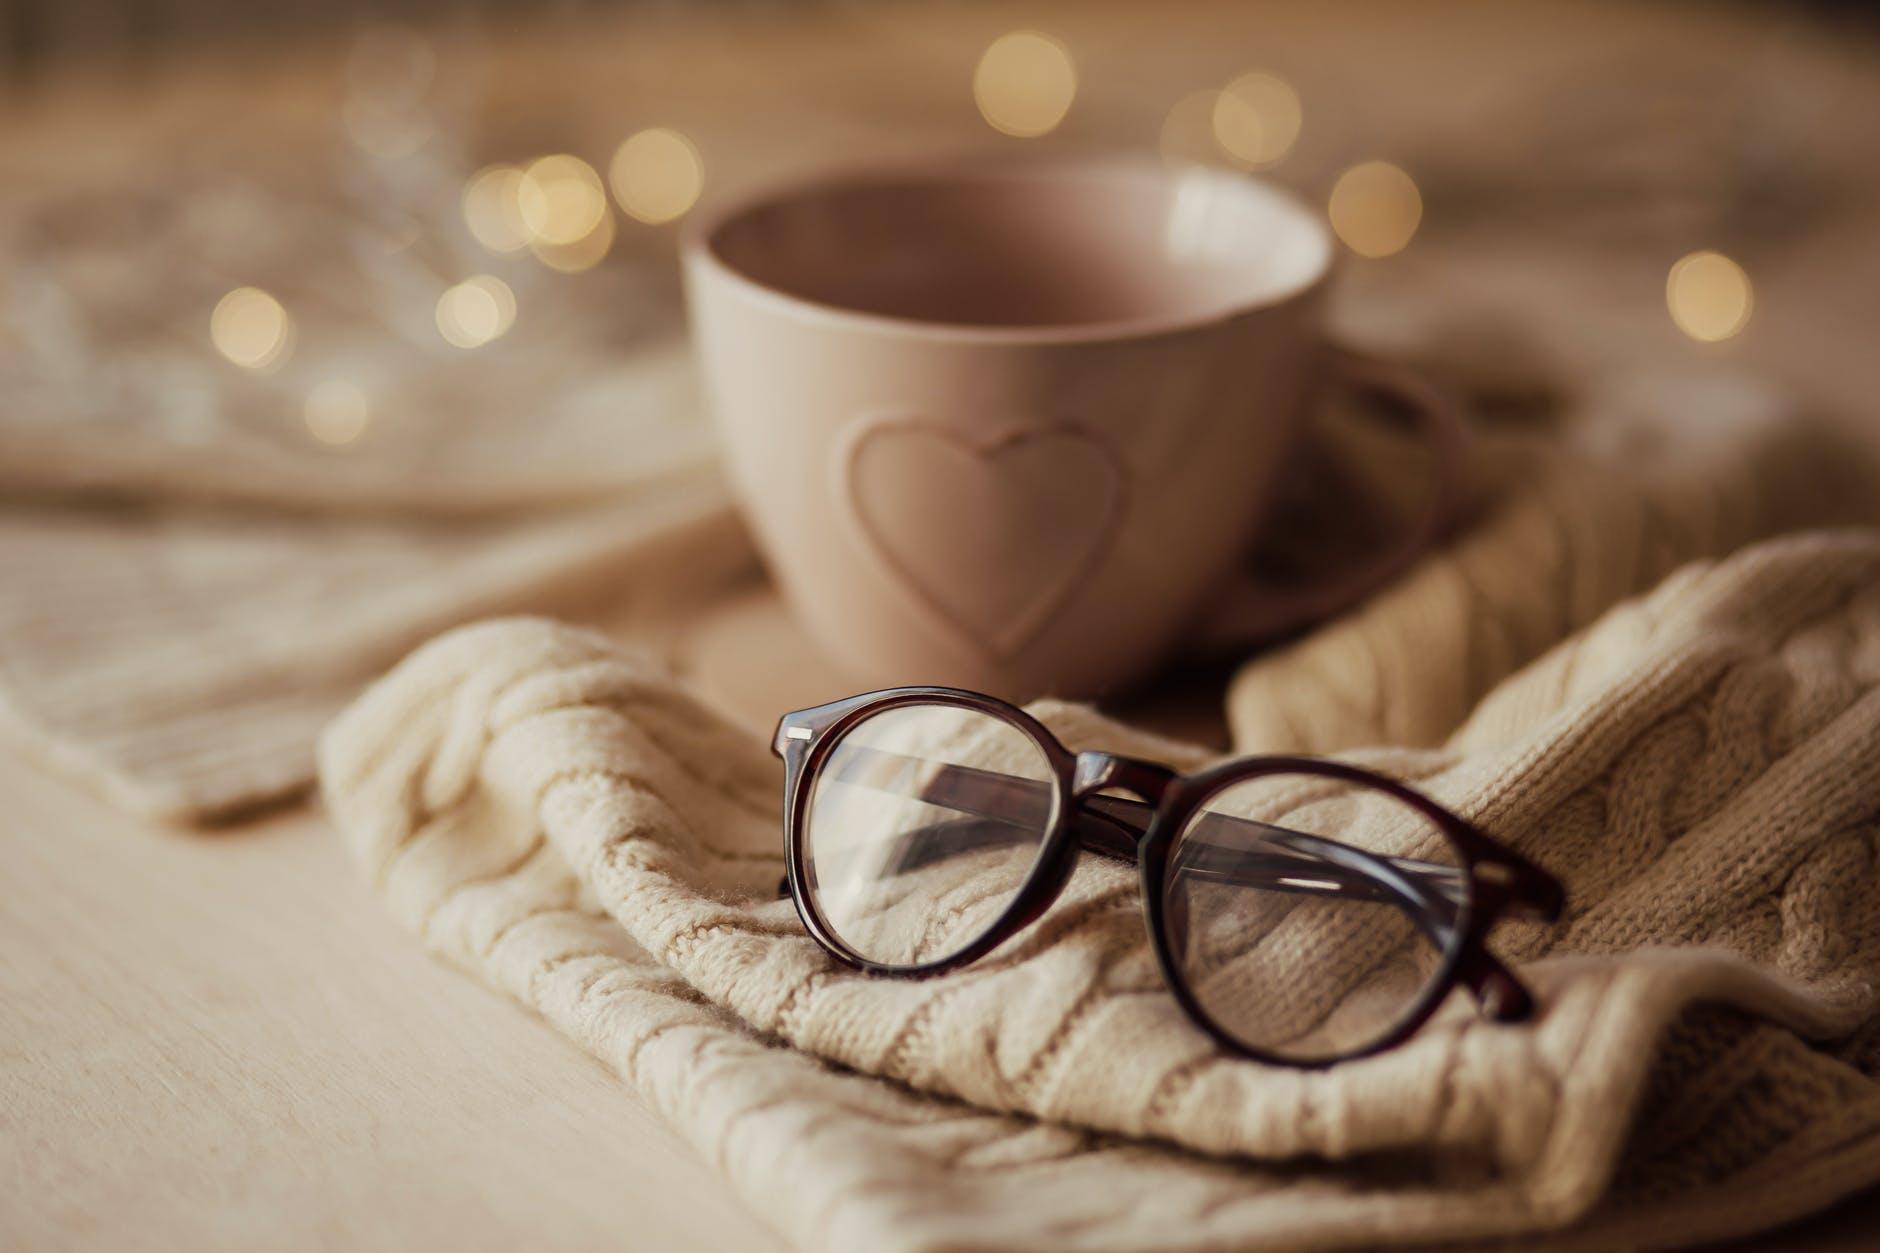 eyeglasses with mug on warm scarf